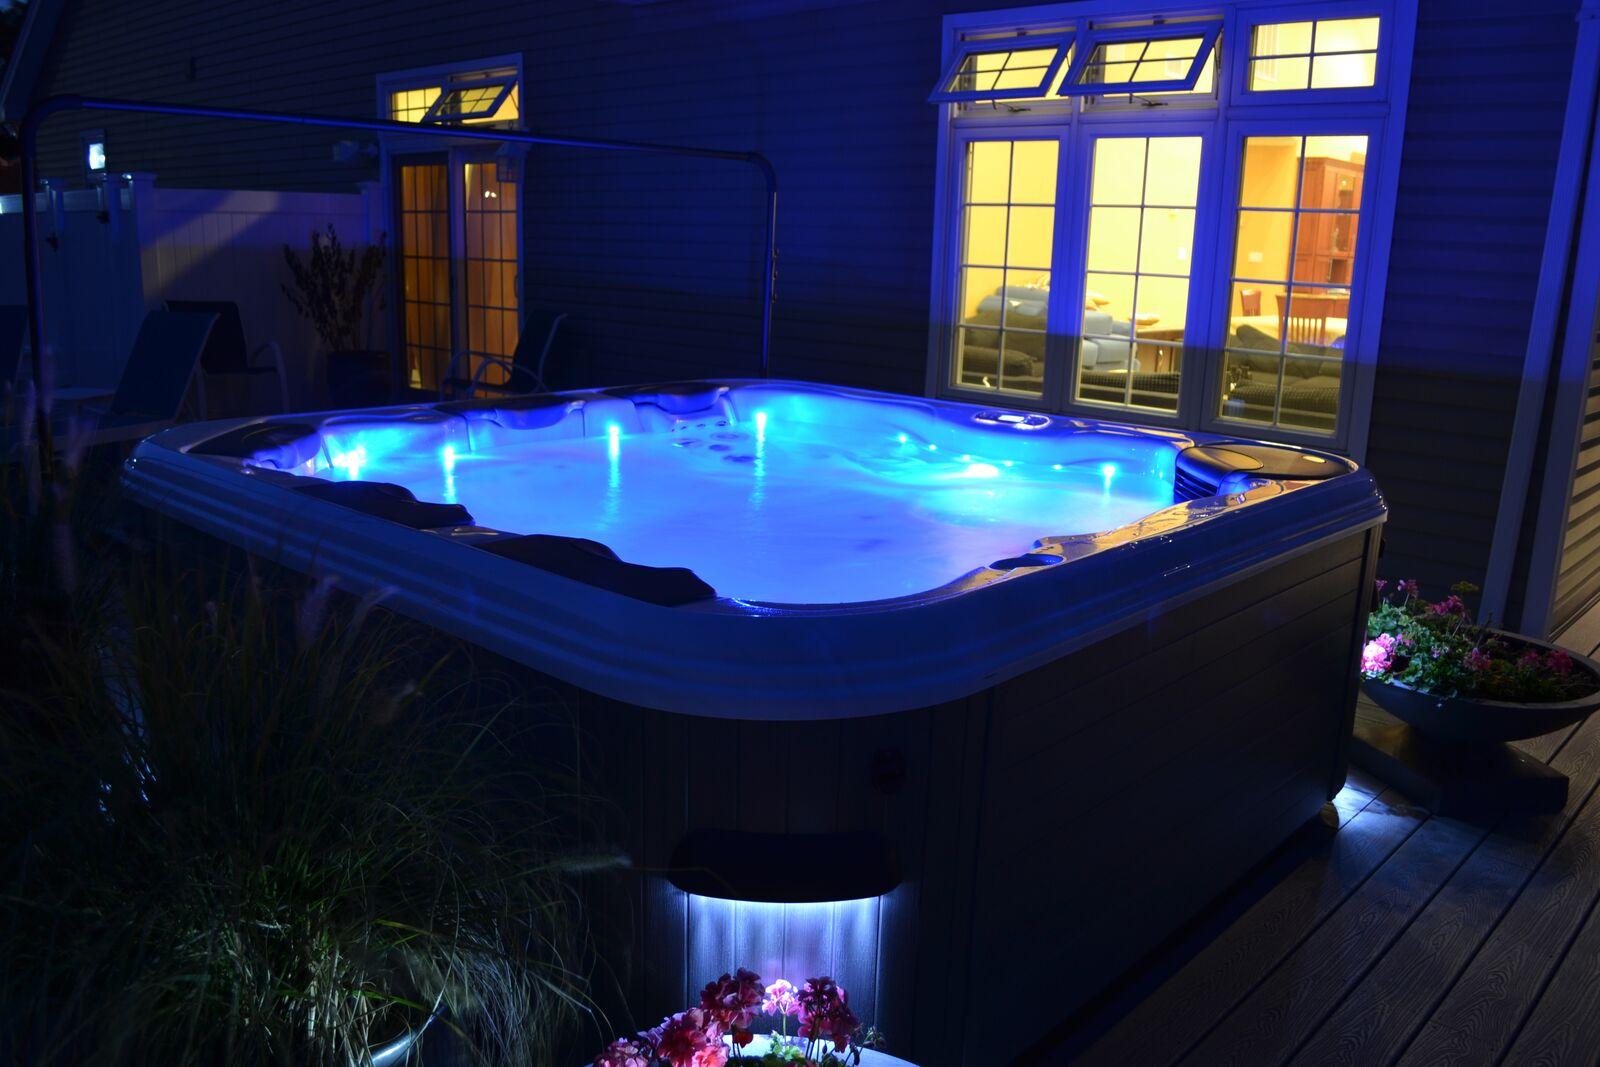 Lighting Backyard Escapes Nothing Enhances Like A Hot Tub